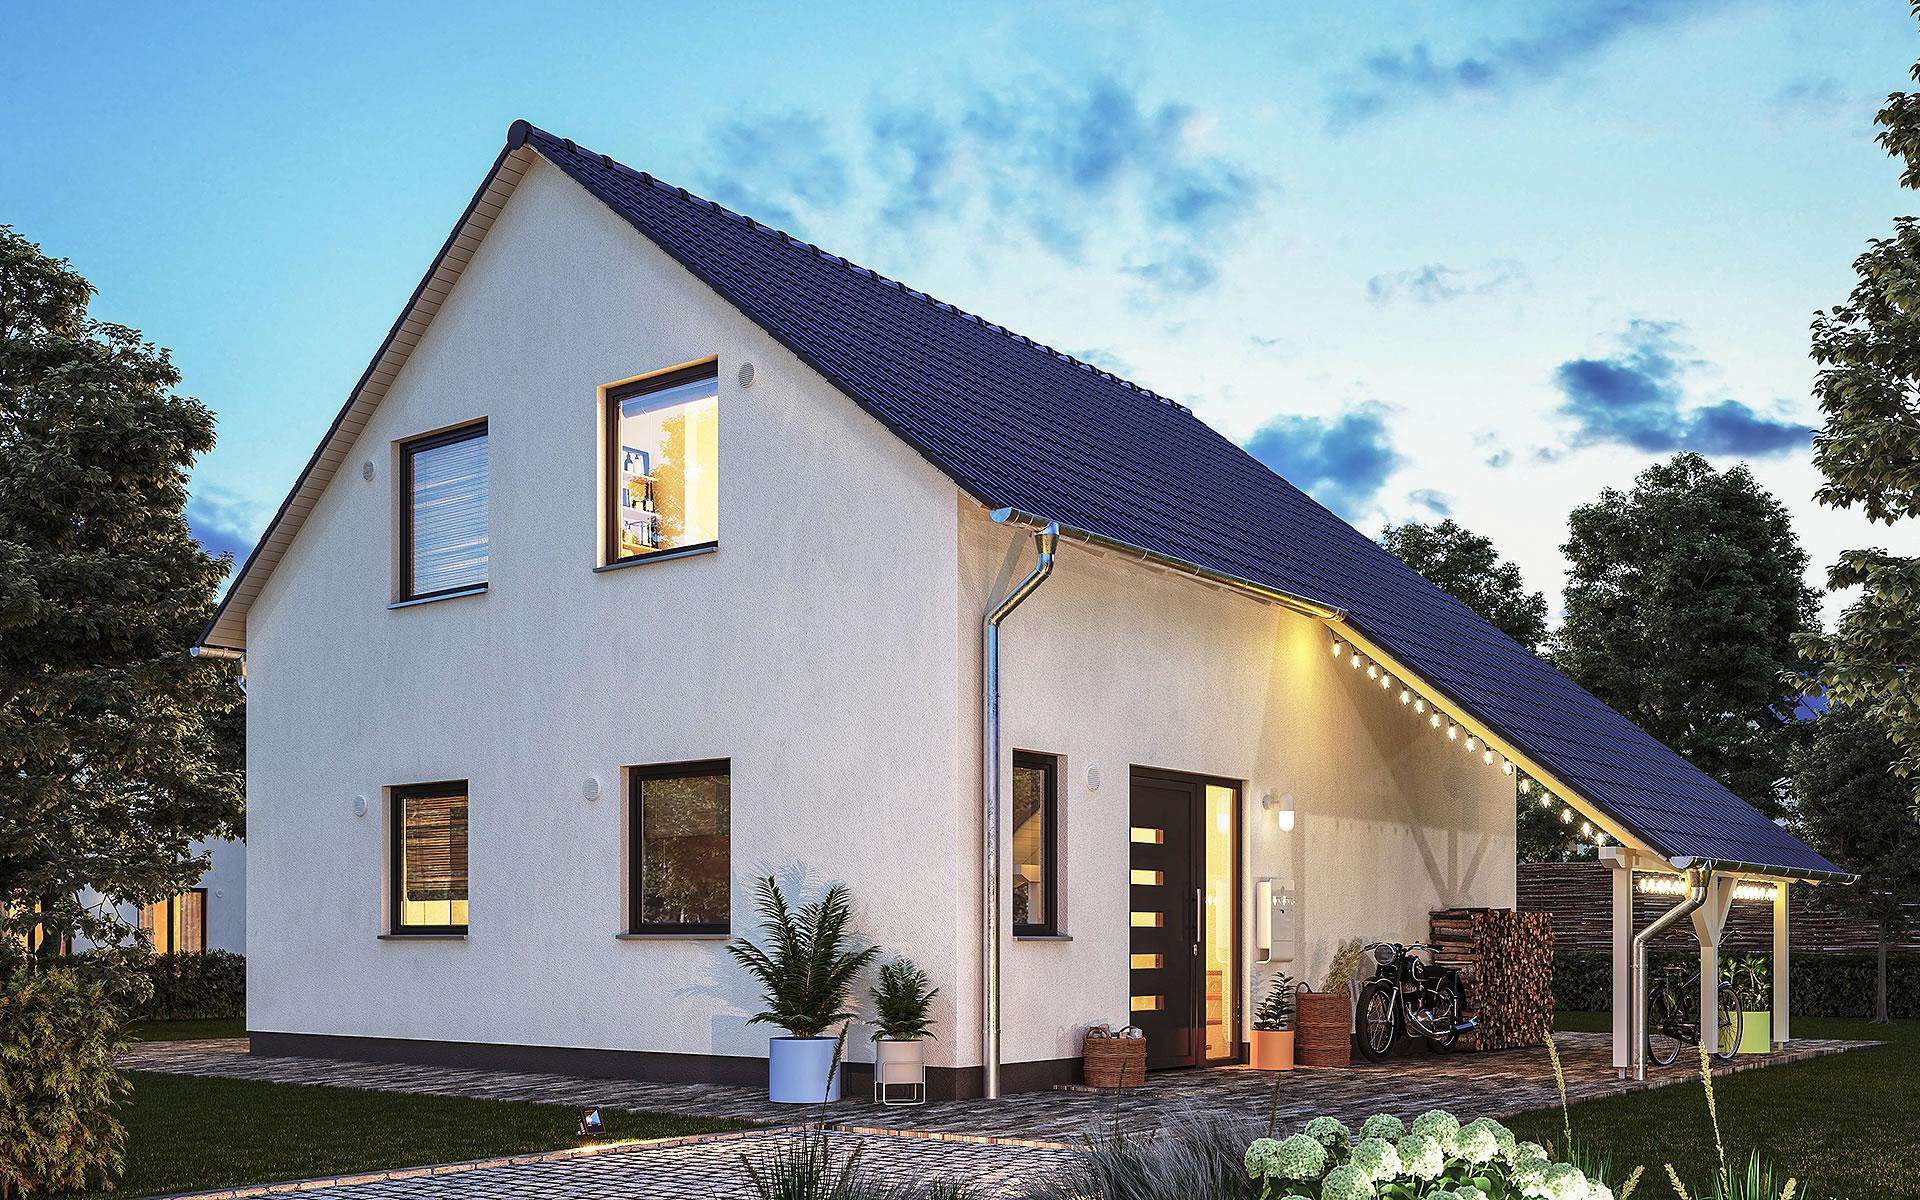 Wintergartenhaus 118 - Town & Country Haus Lizenzgeber GmbH